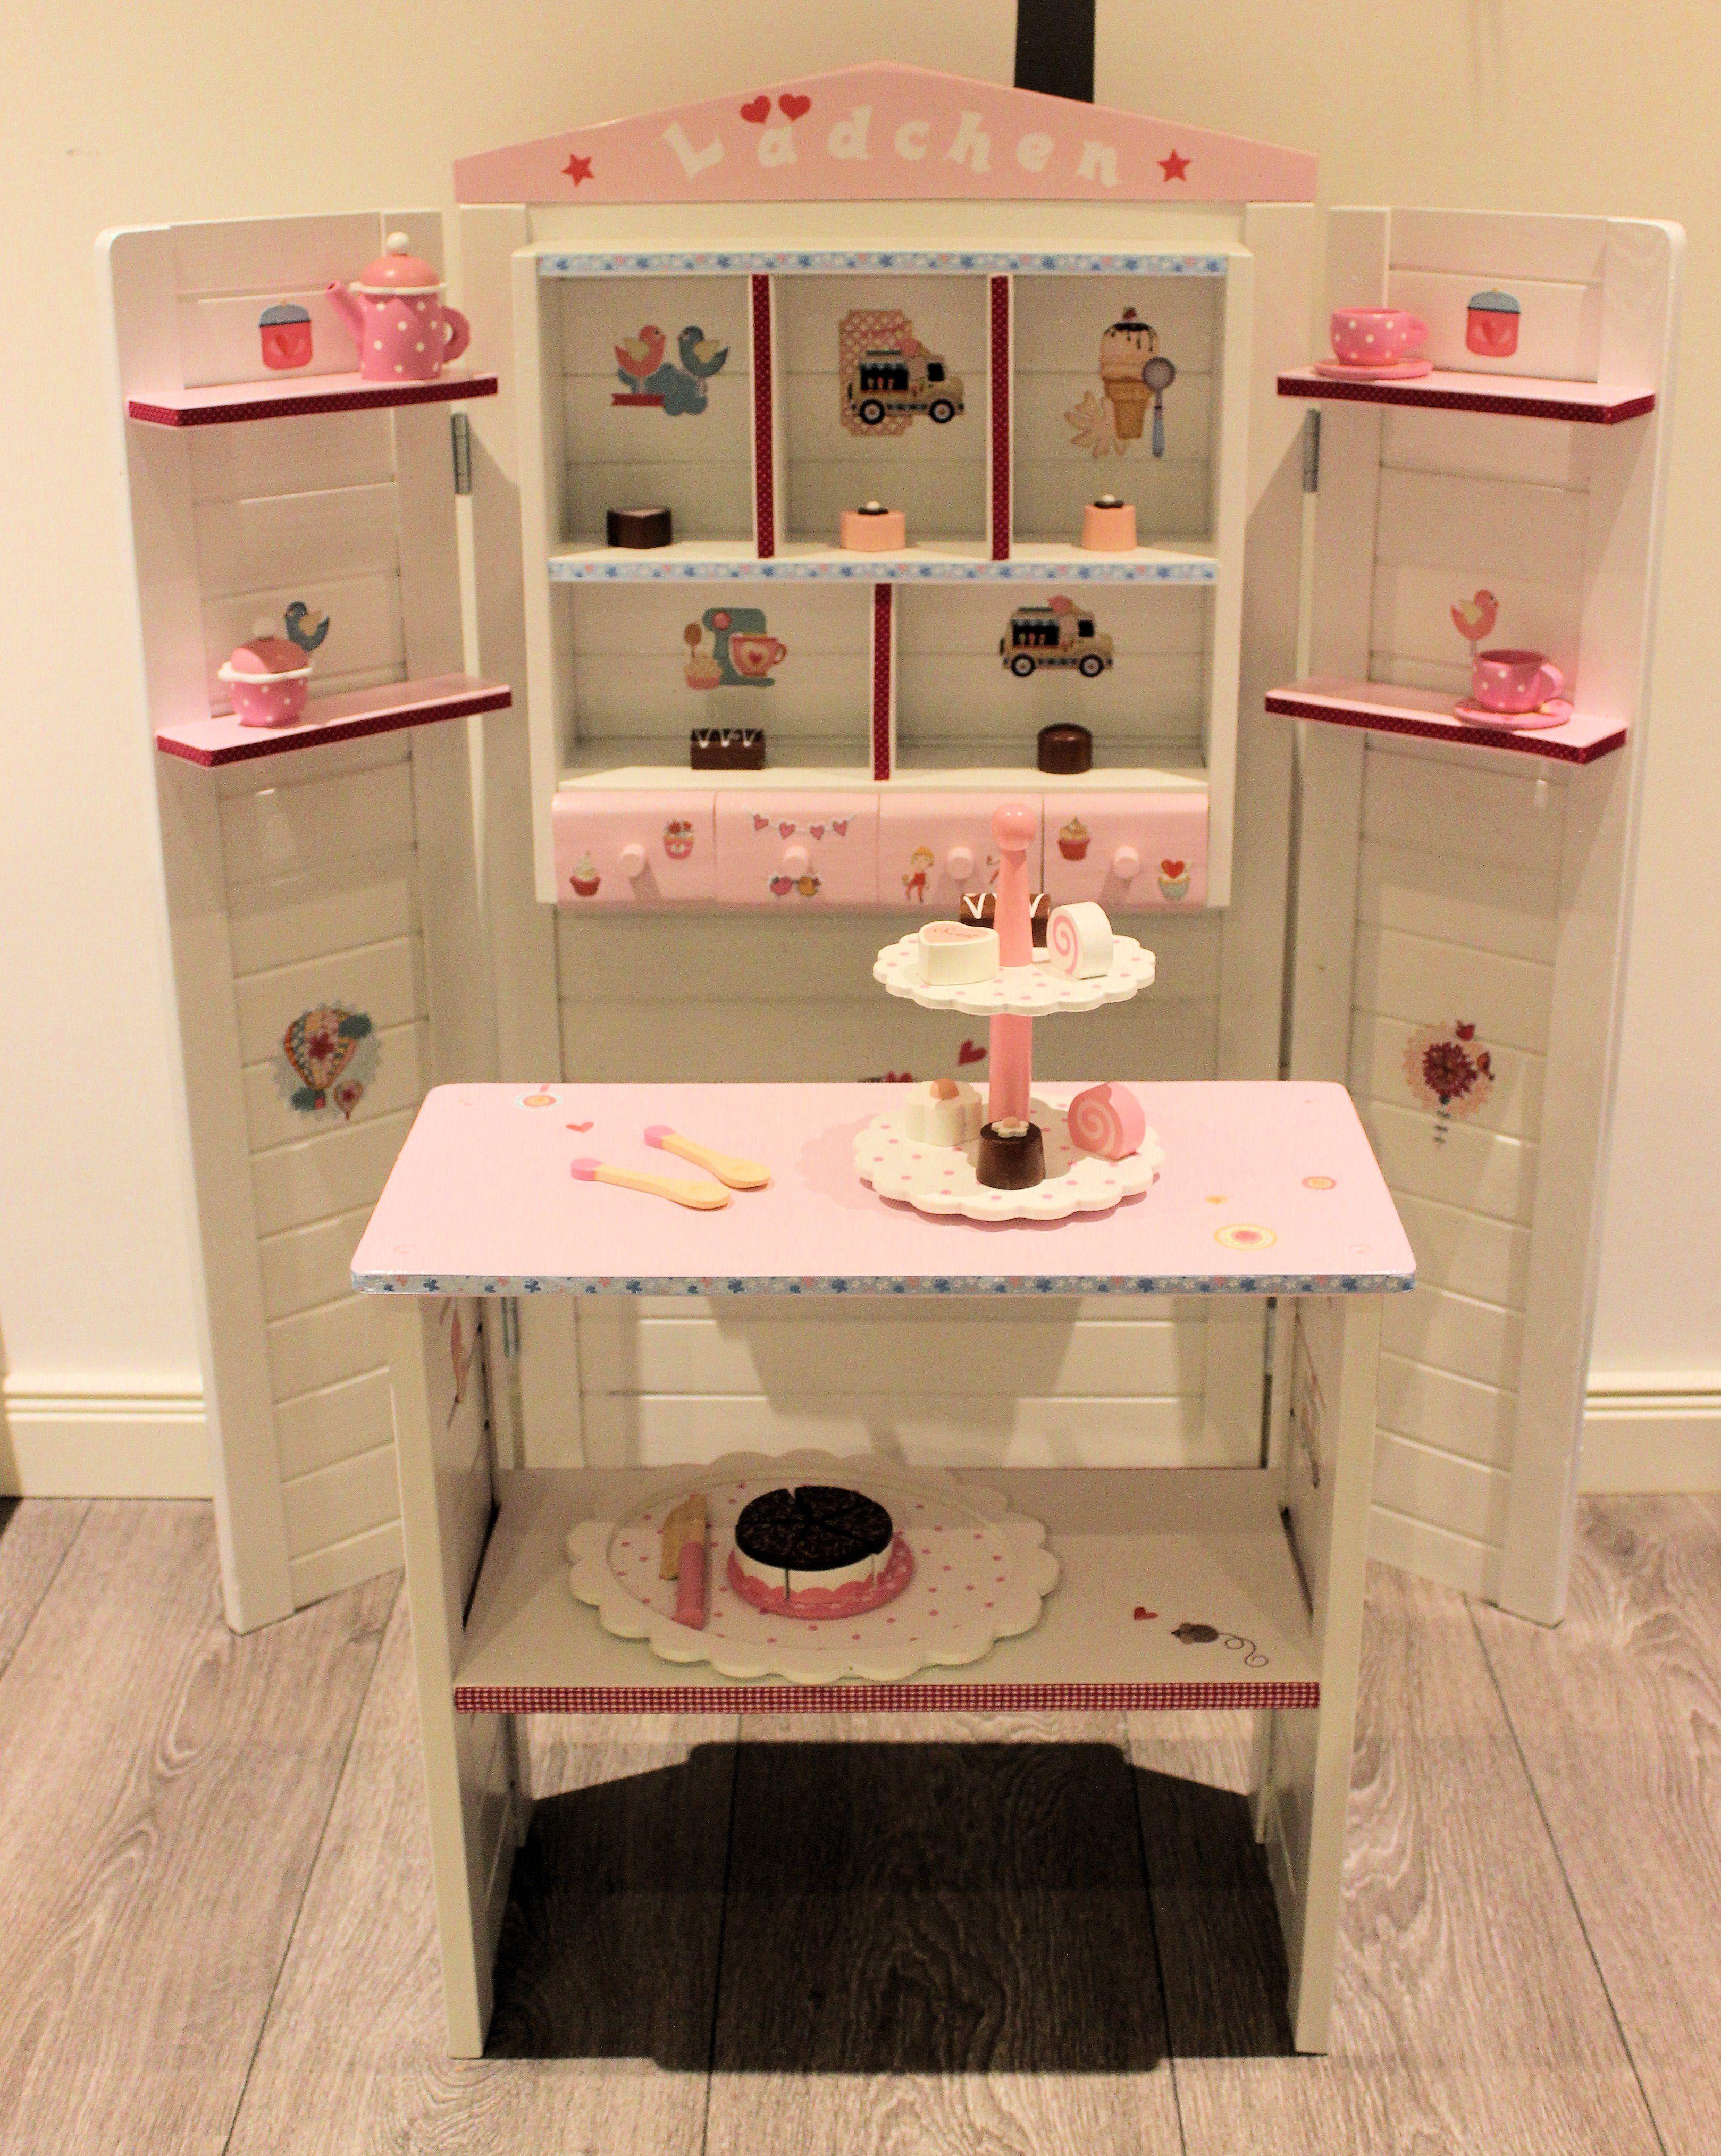 kaufladen wei rosa domis pusteblume pinterest kaufladen wolle kaufen und kaufladen wei. Black Bedroom Furniture Sets. Home Design Ideas